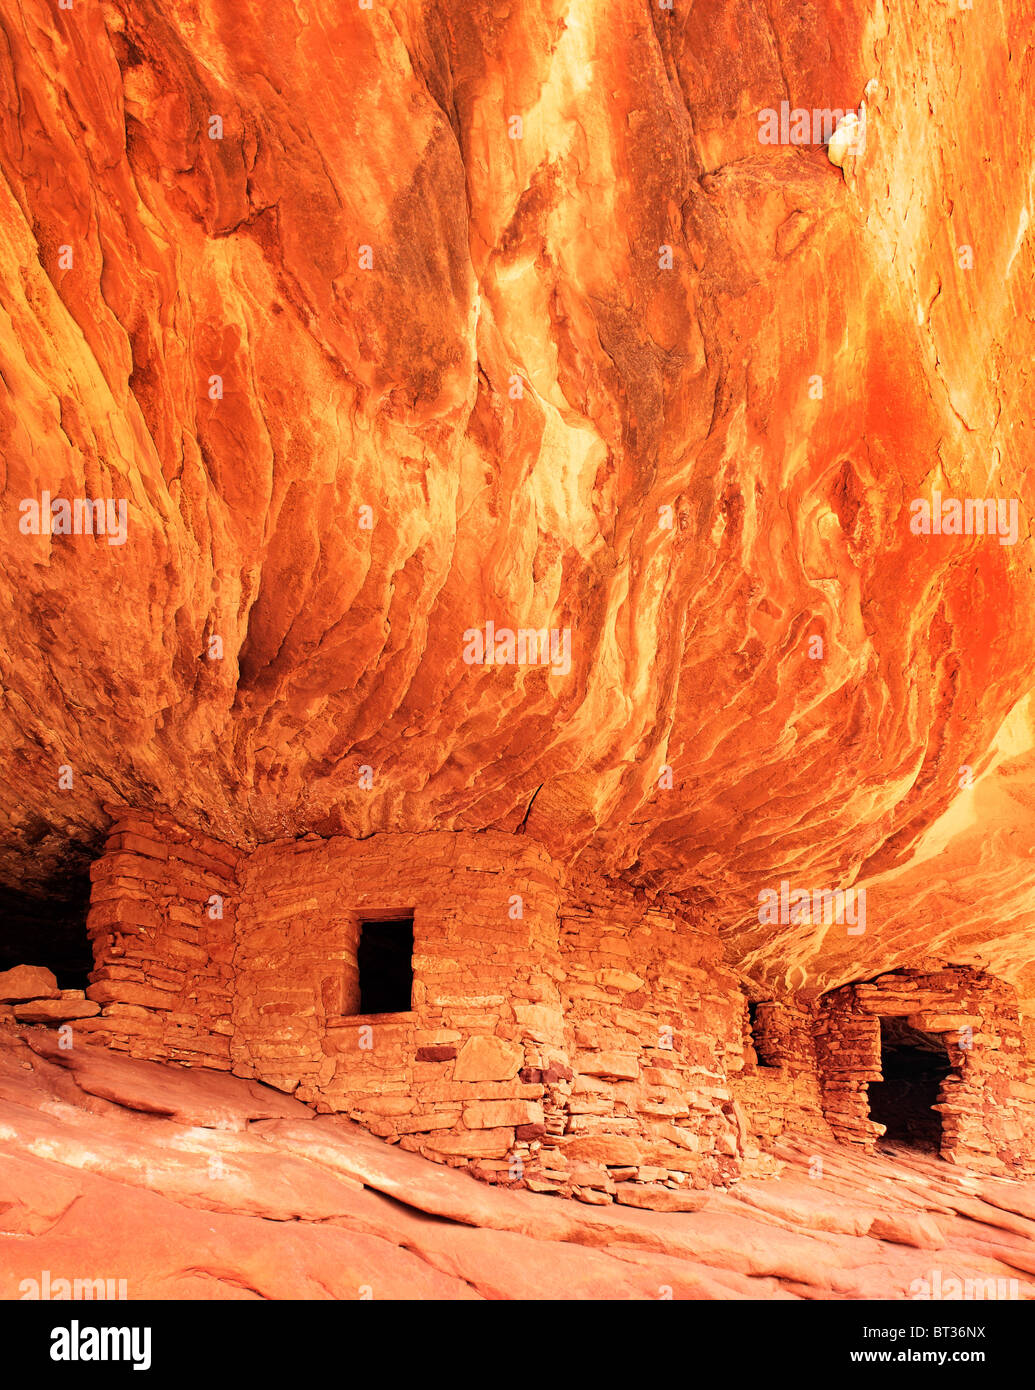 """Flaming soffitto rovina"", antiche rovine Anasazi a Cedar Mesa, Utah, Stati Uniti d'America Immagini Stock"